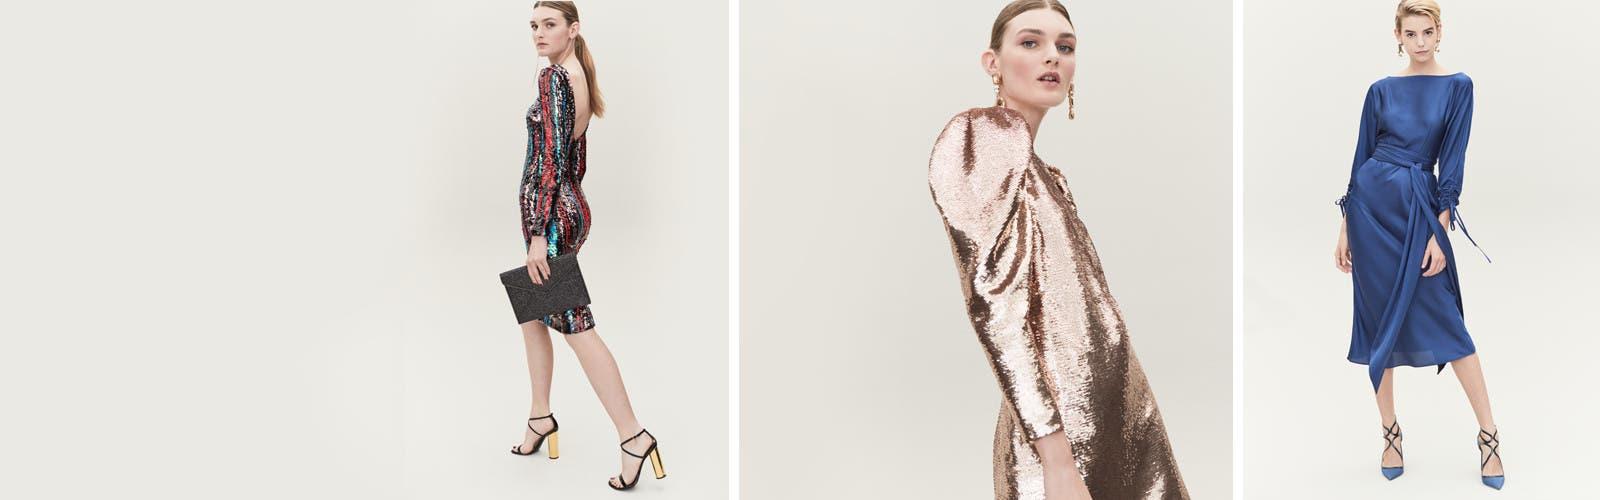 Womens Bardot Dresses Nordstrom Jolie Clothing Neil Polka Midi Dress Dazzling For Any Occasion